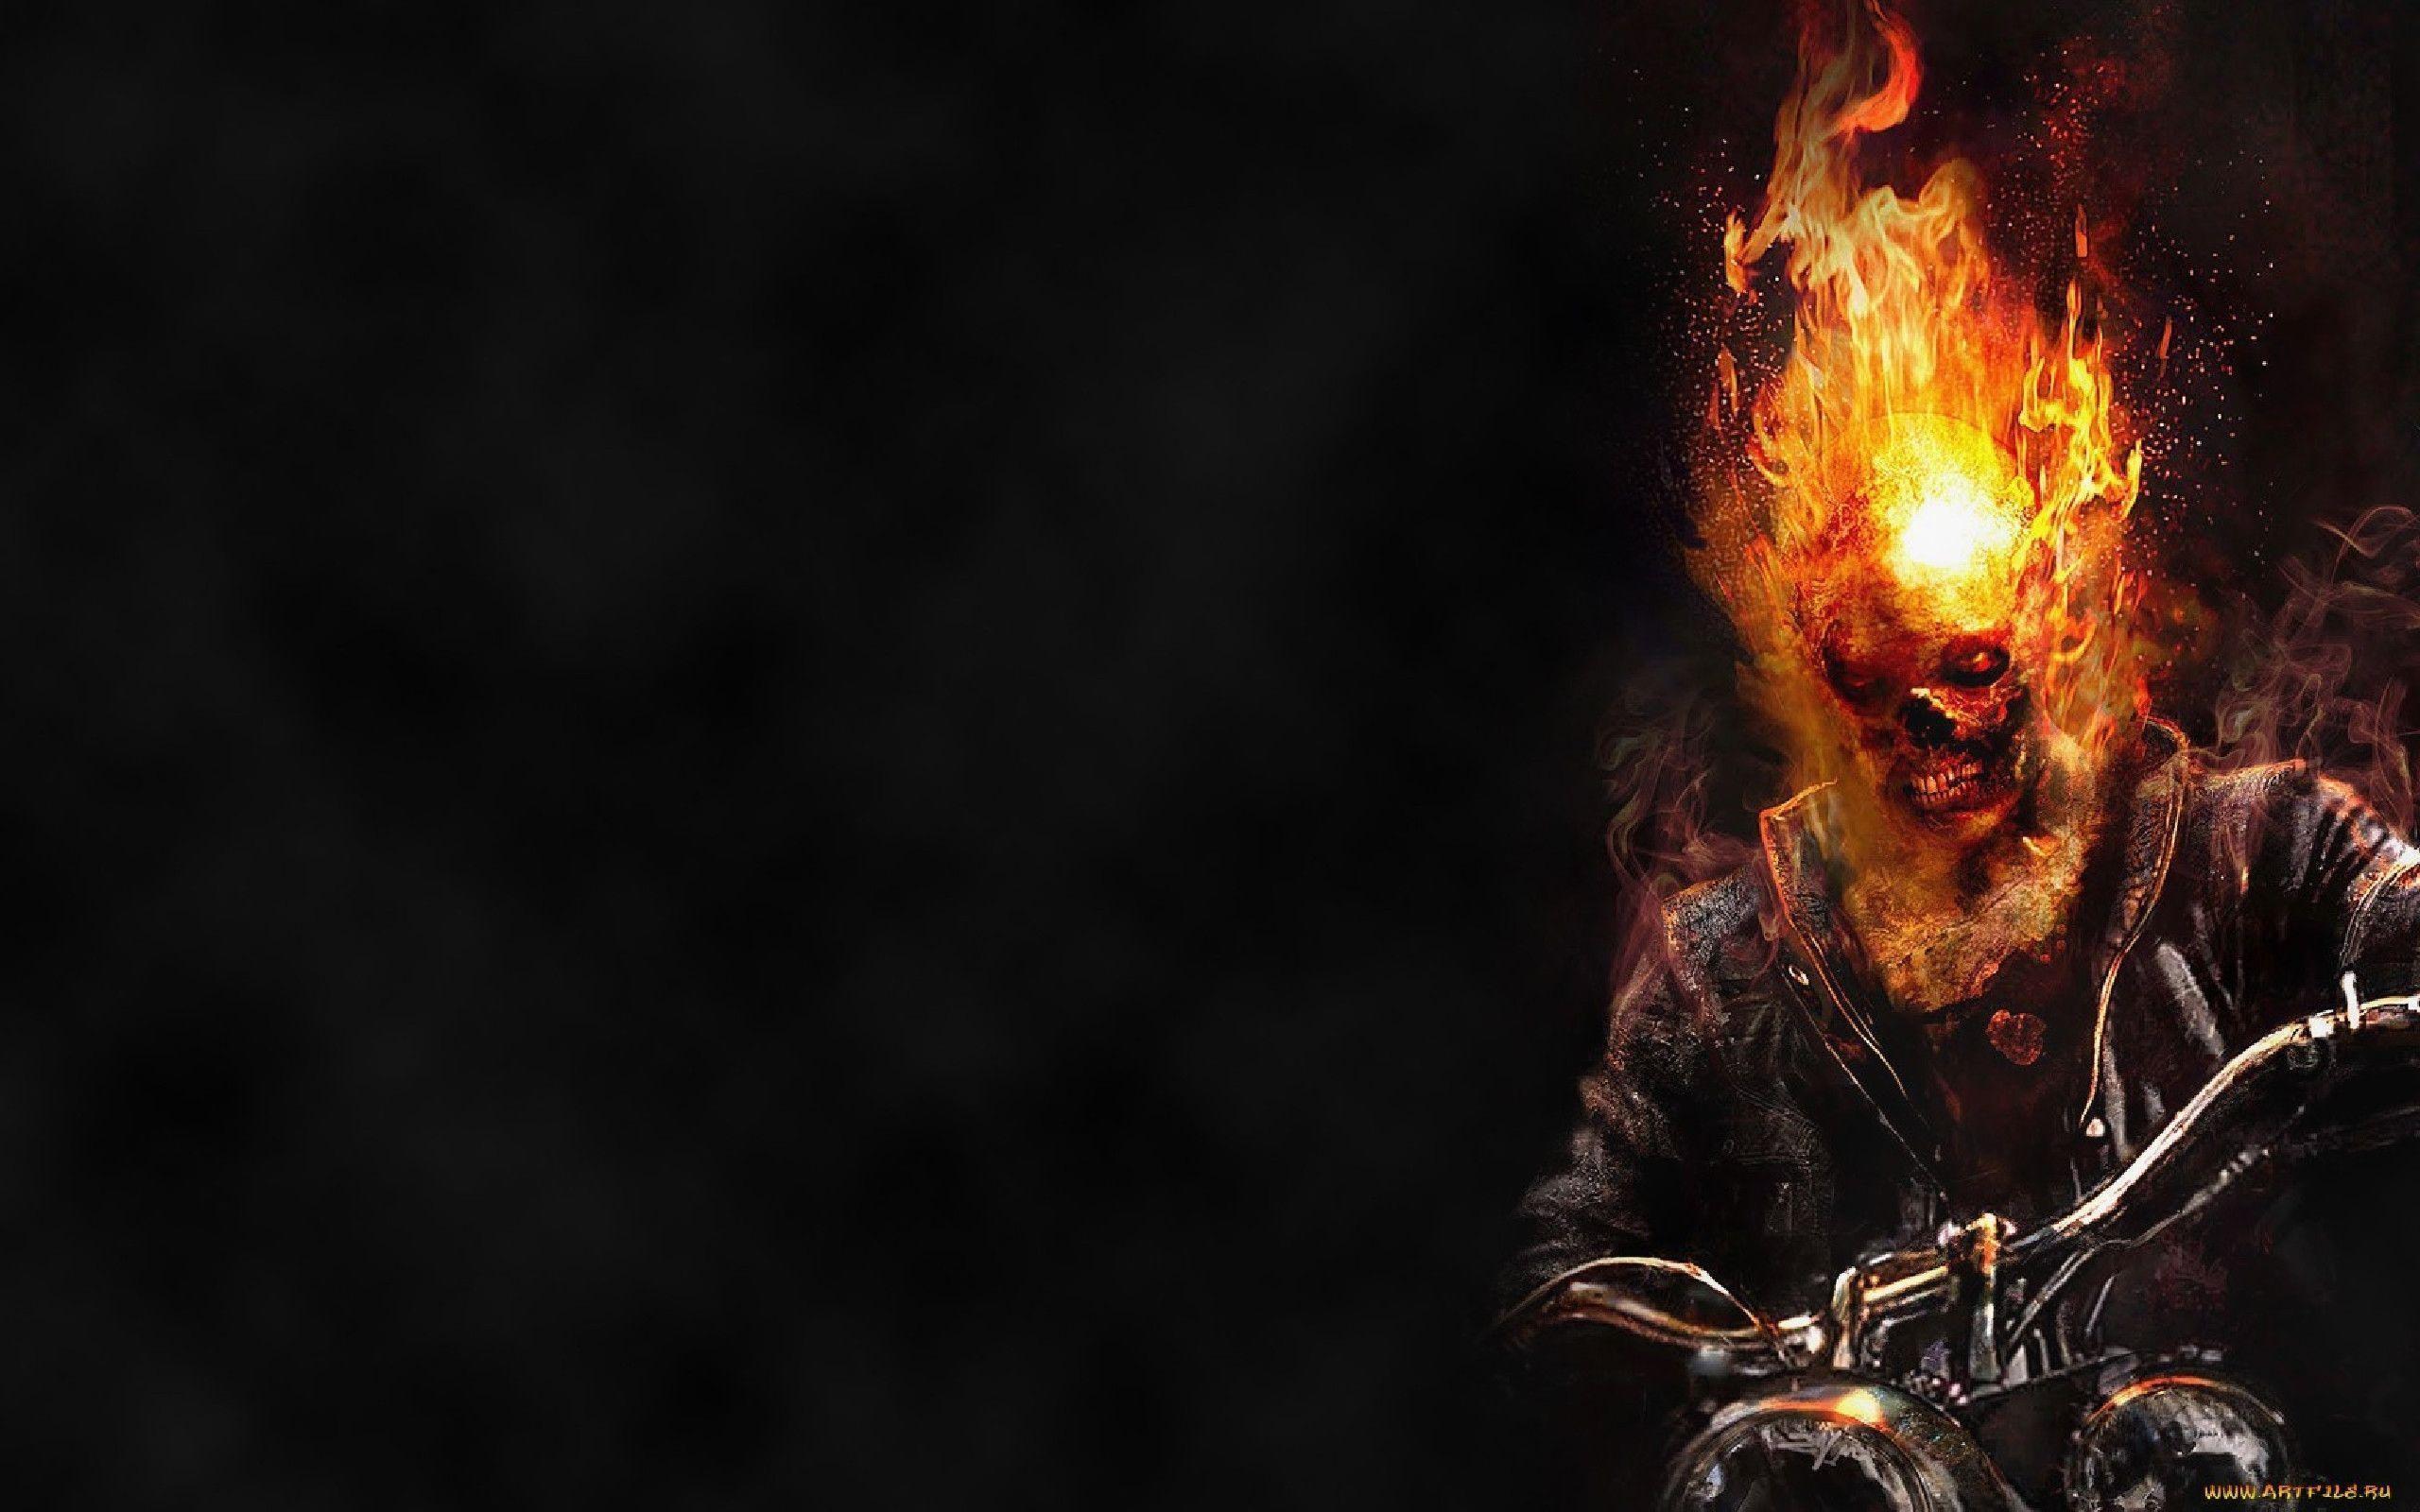 Ghost rider – The Ghost Rider Wallpaper (36926458) – Fanpop